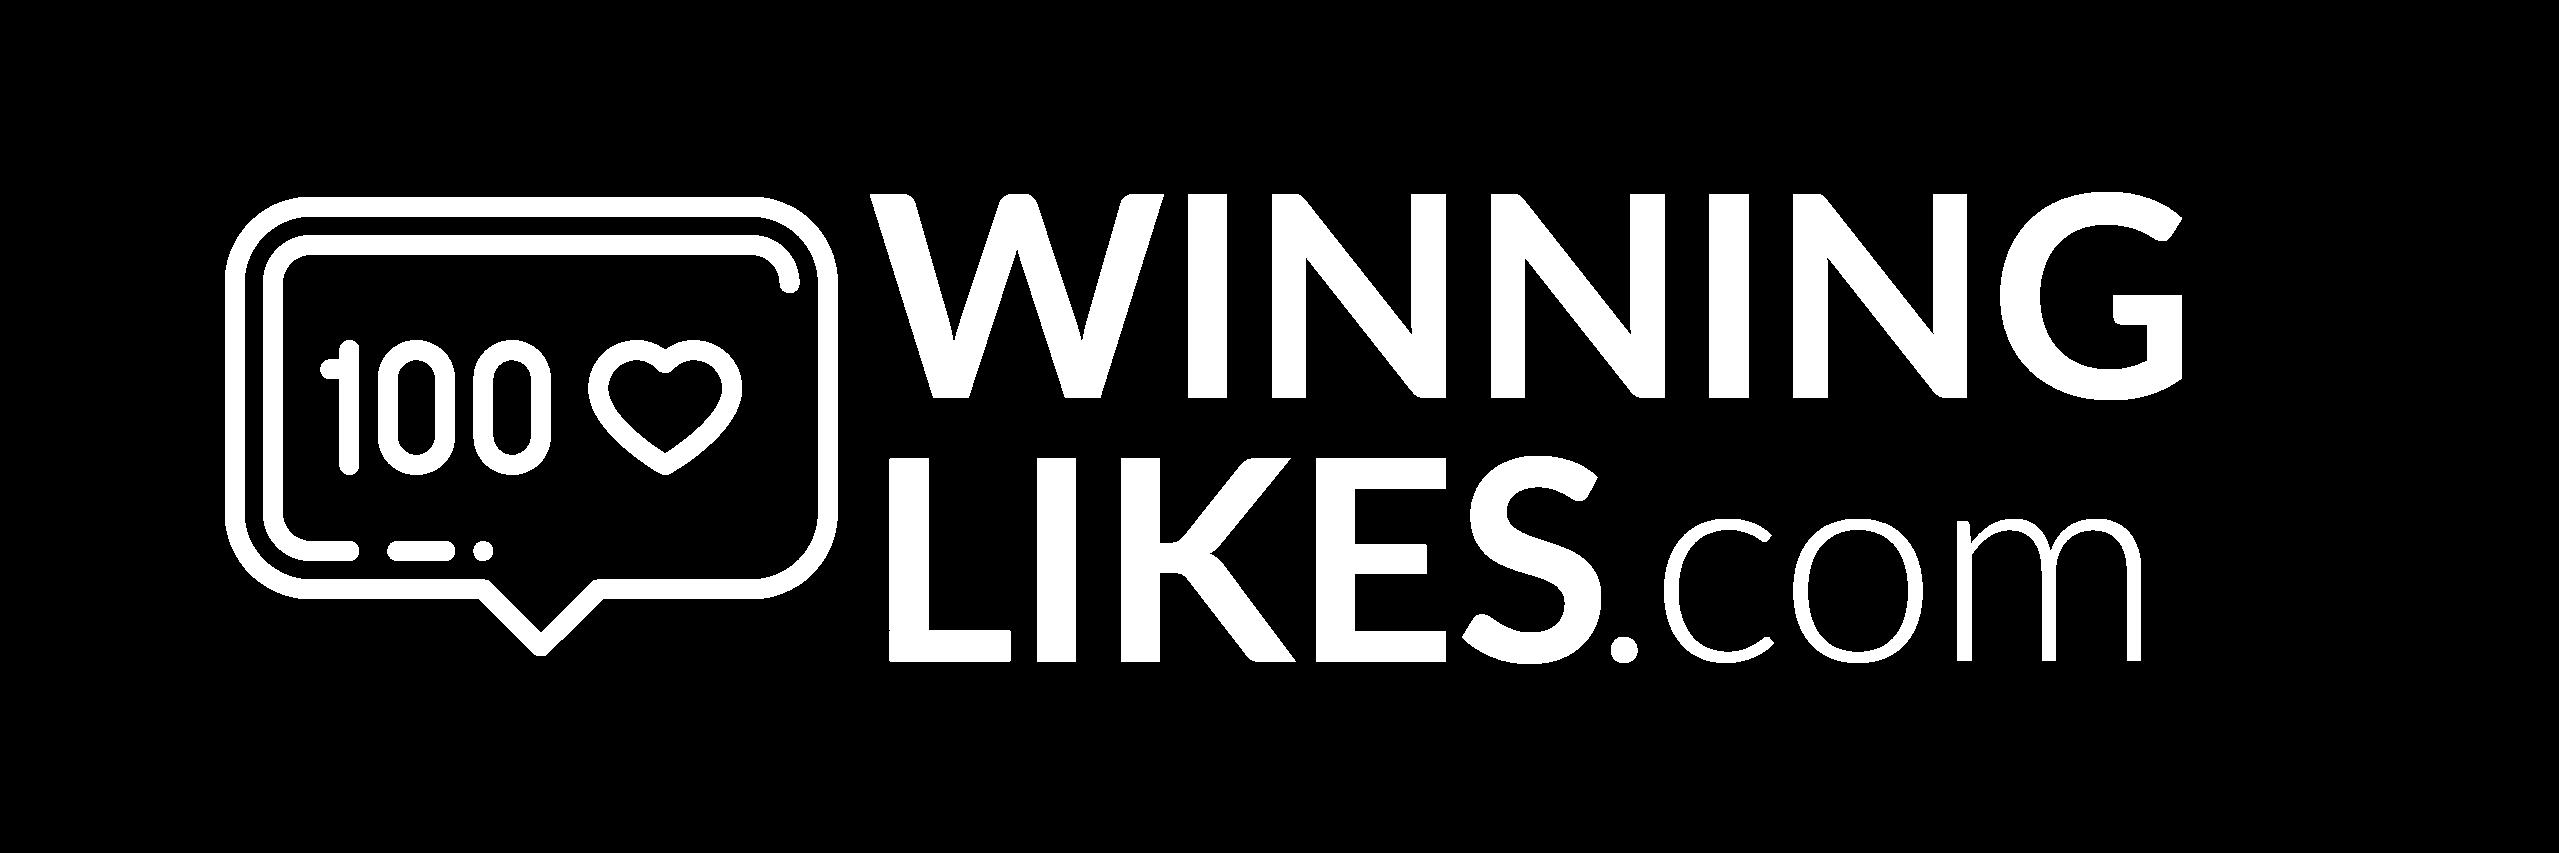 winninglikes.com